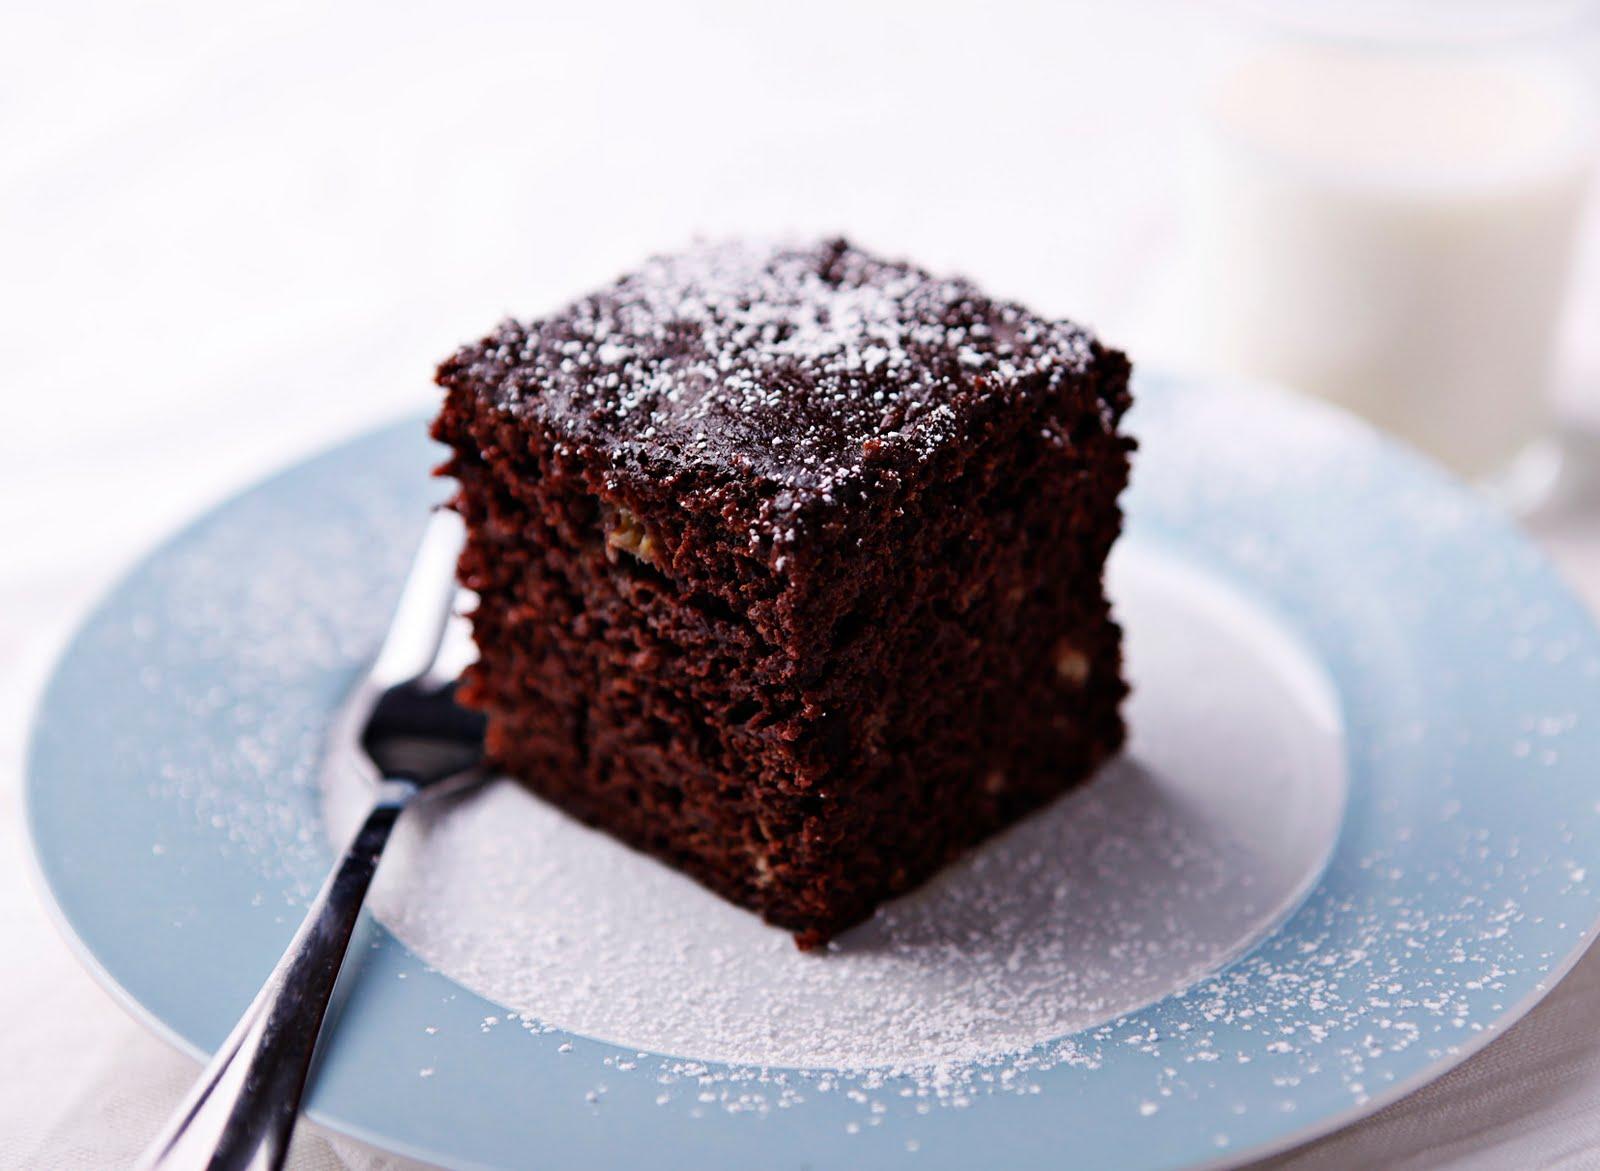 Banana chocolate snack cake recipe